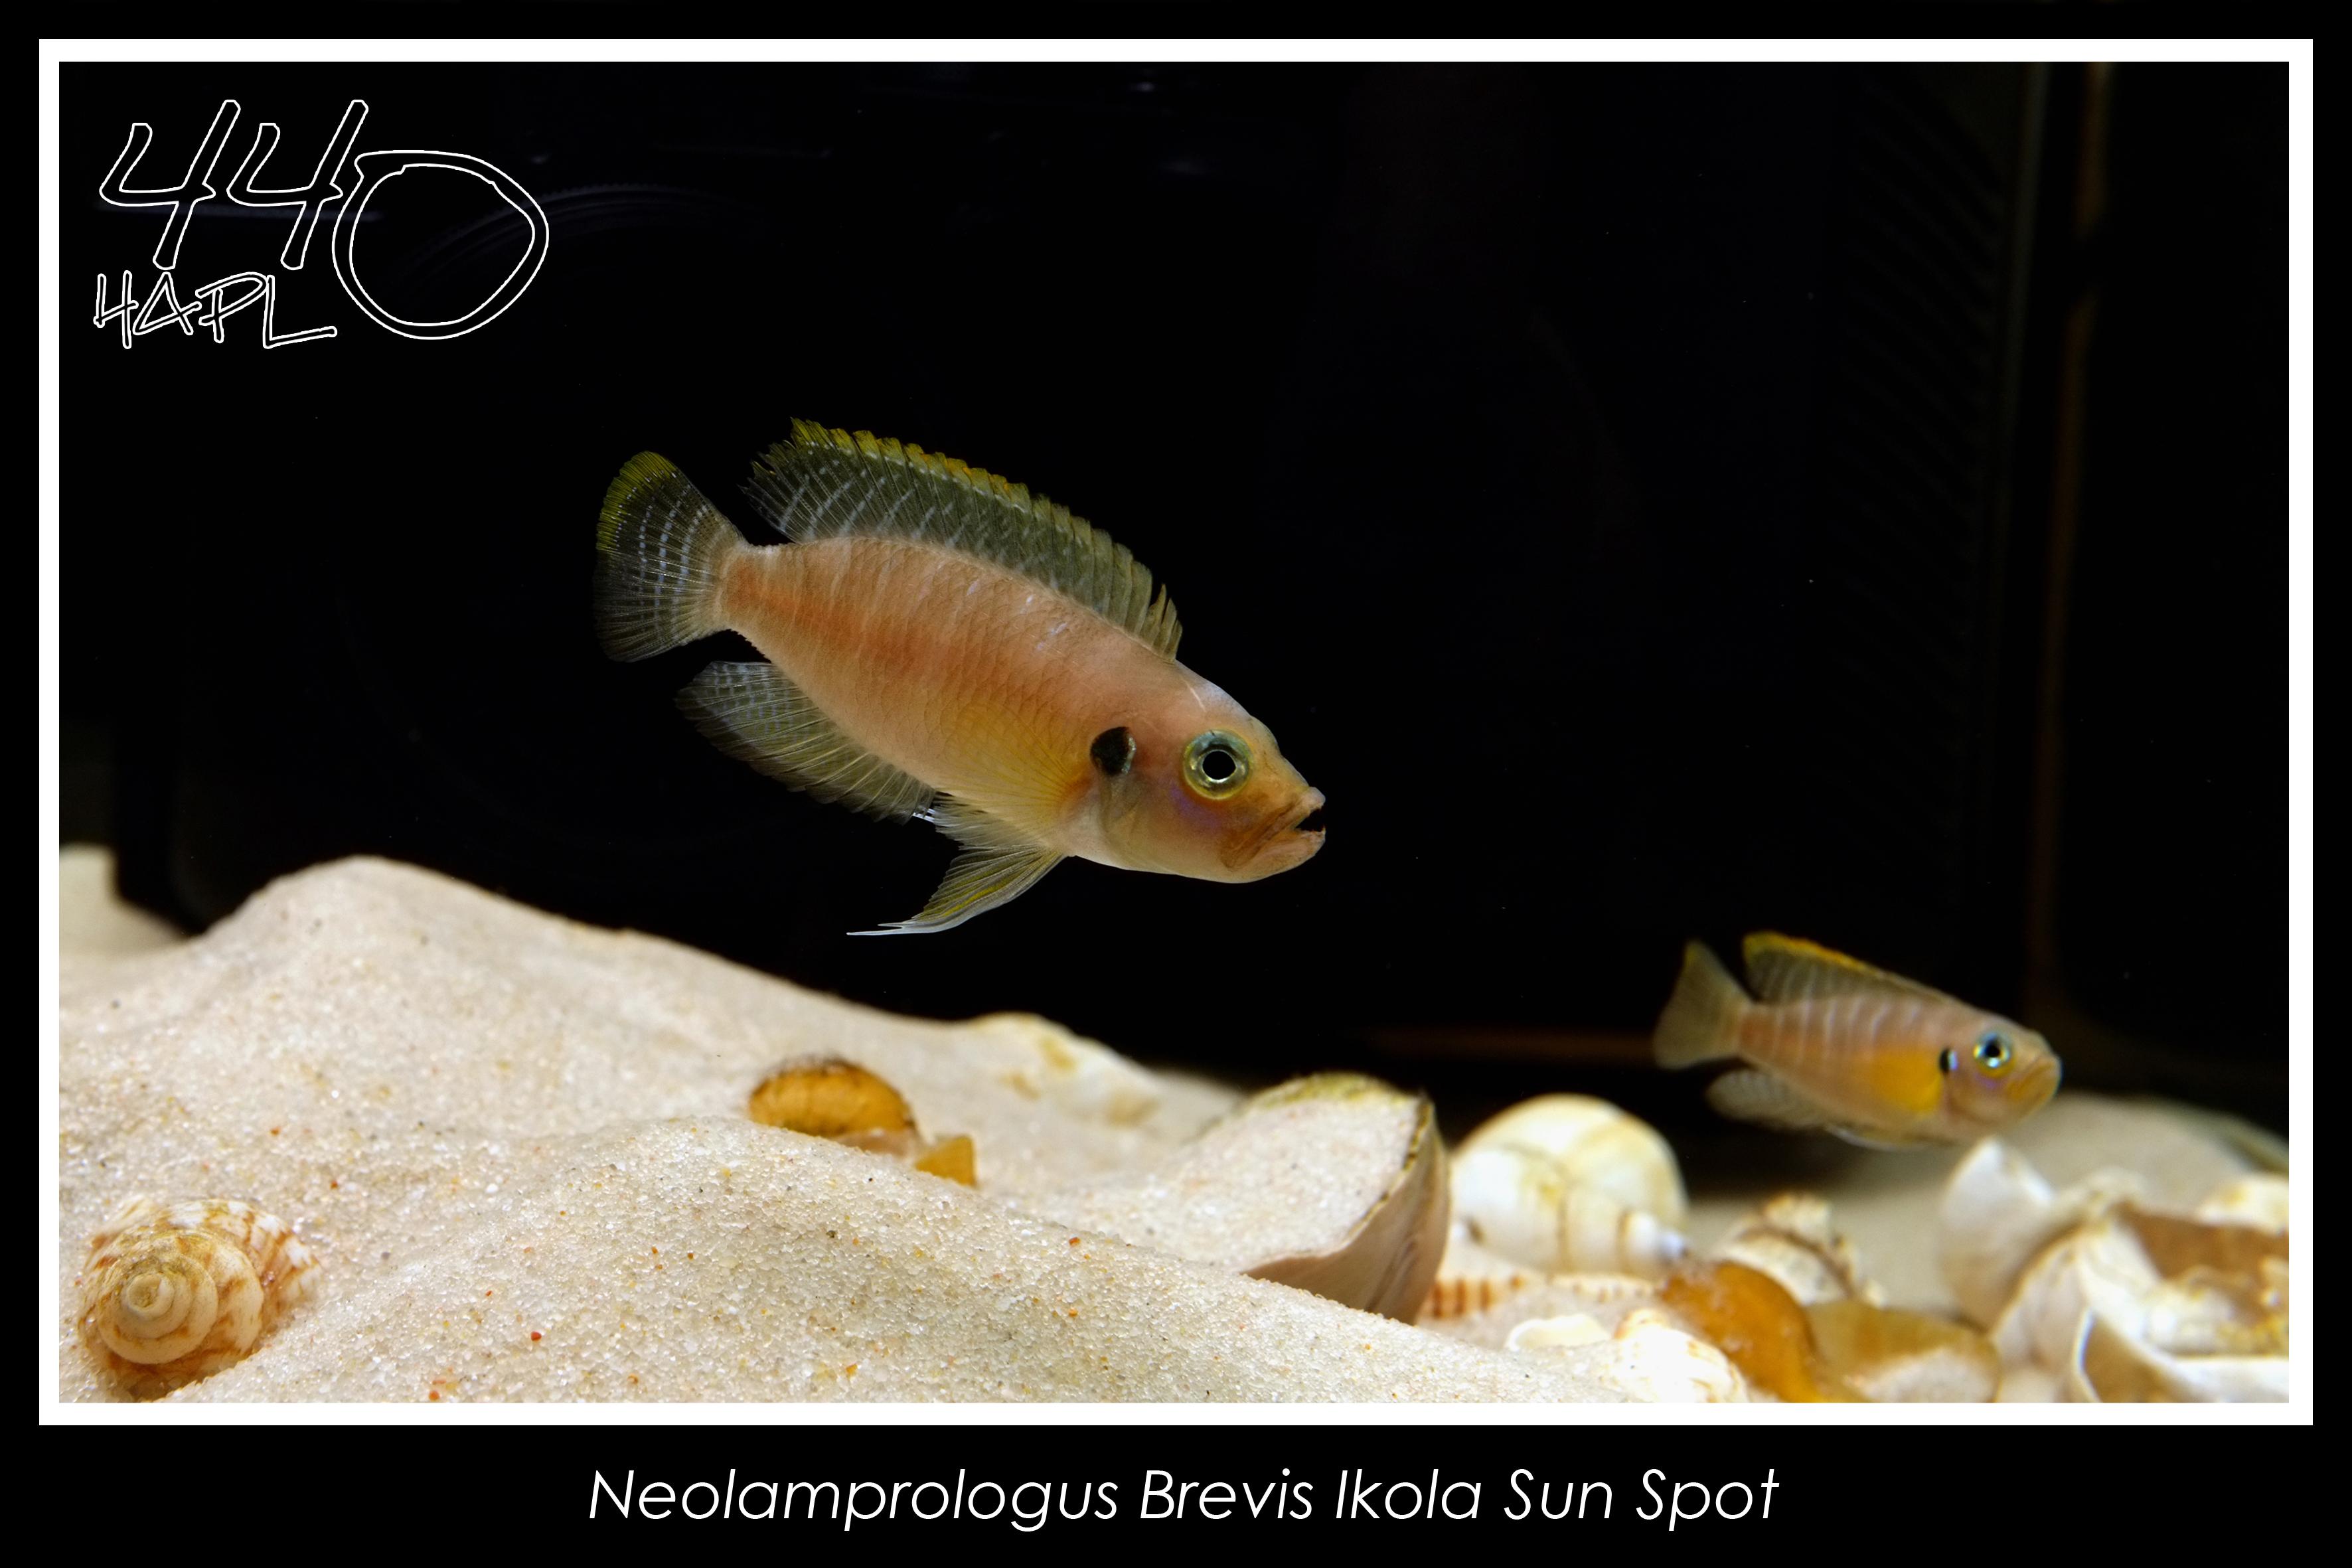 Neolamprologus Brevis cichlids.com: Neolampr...